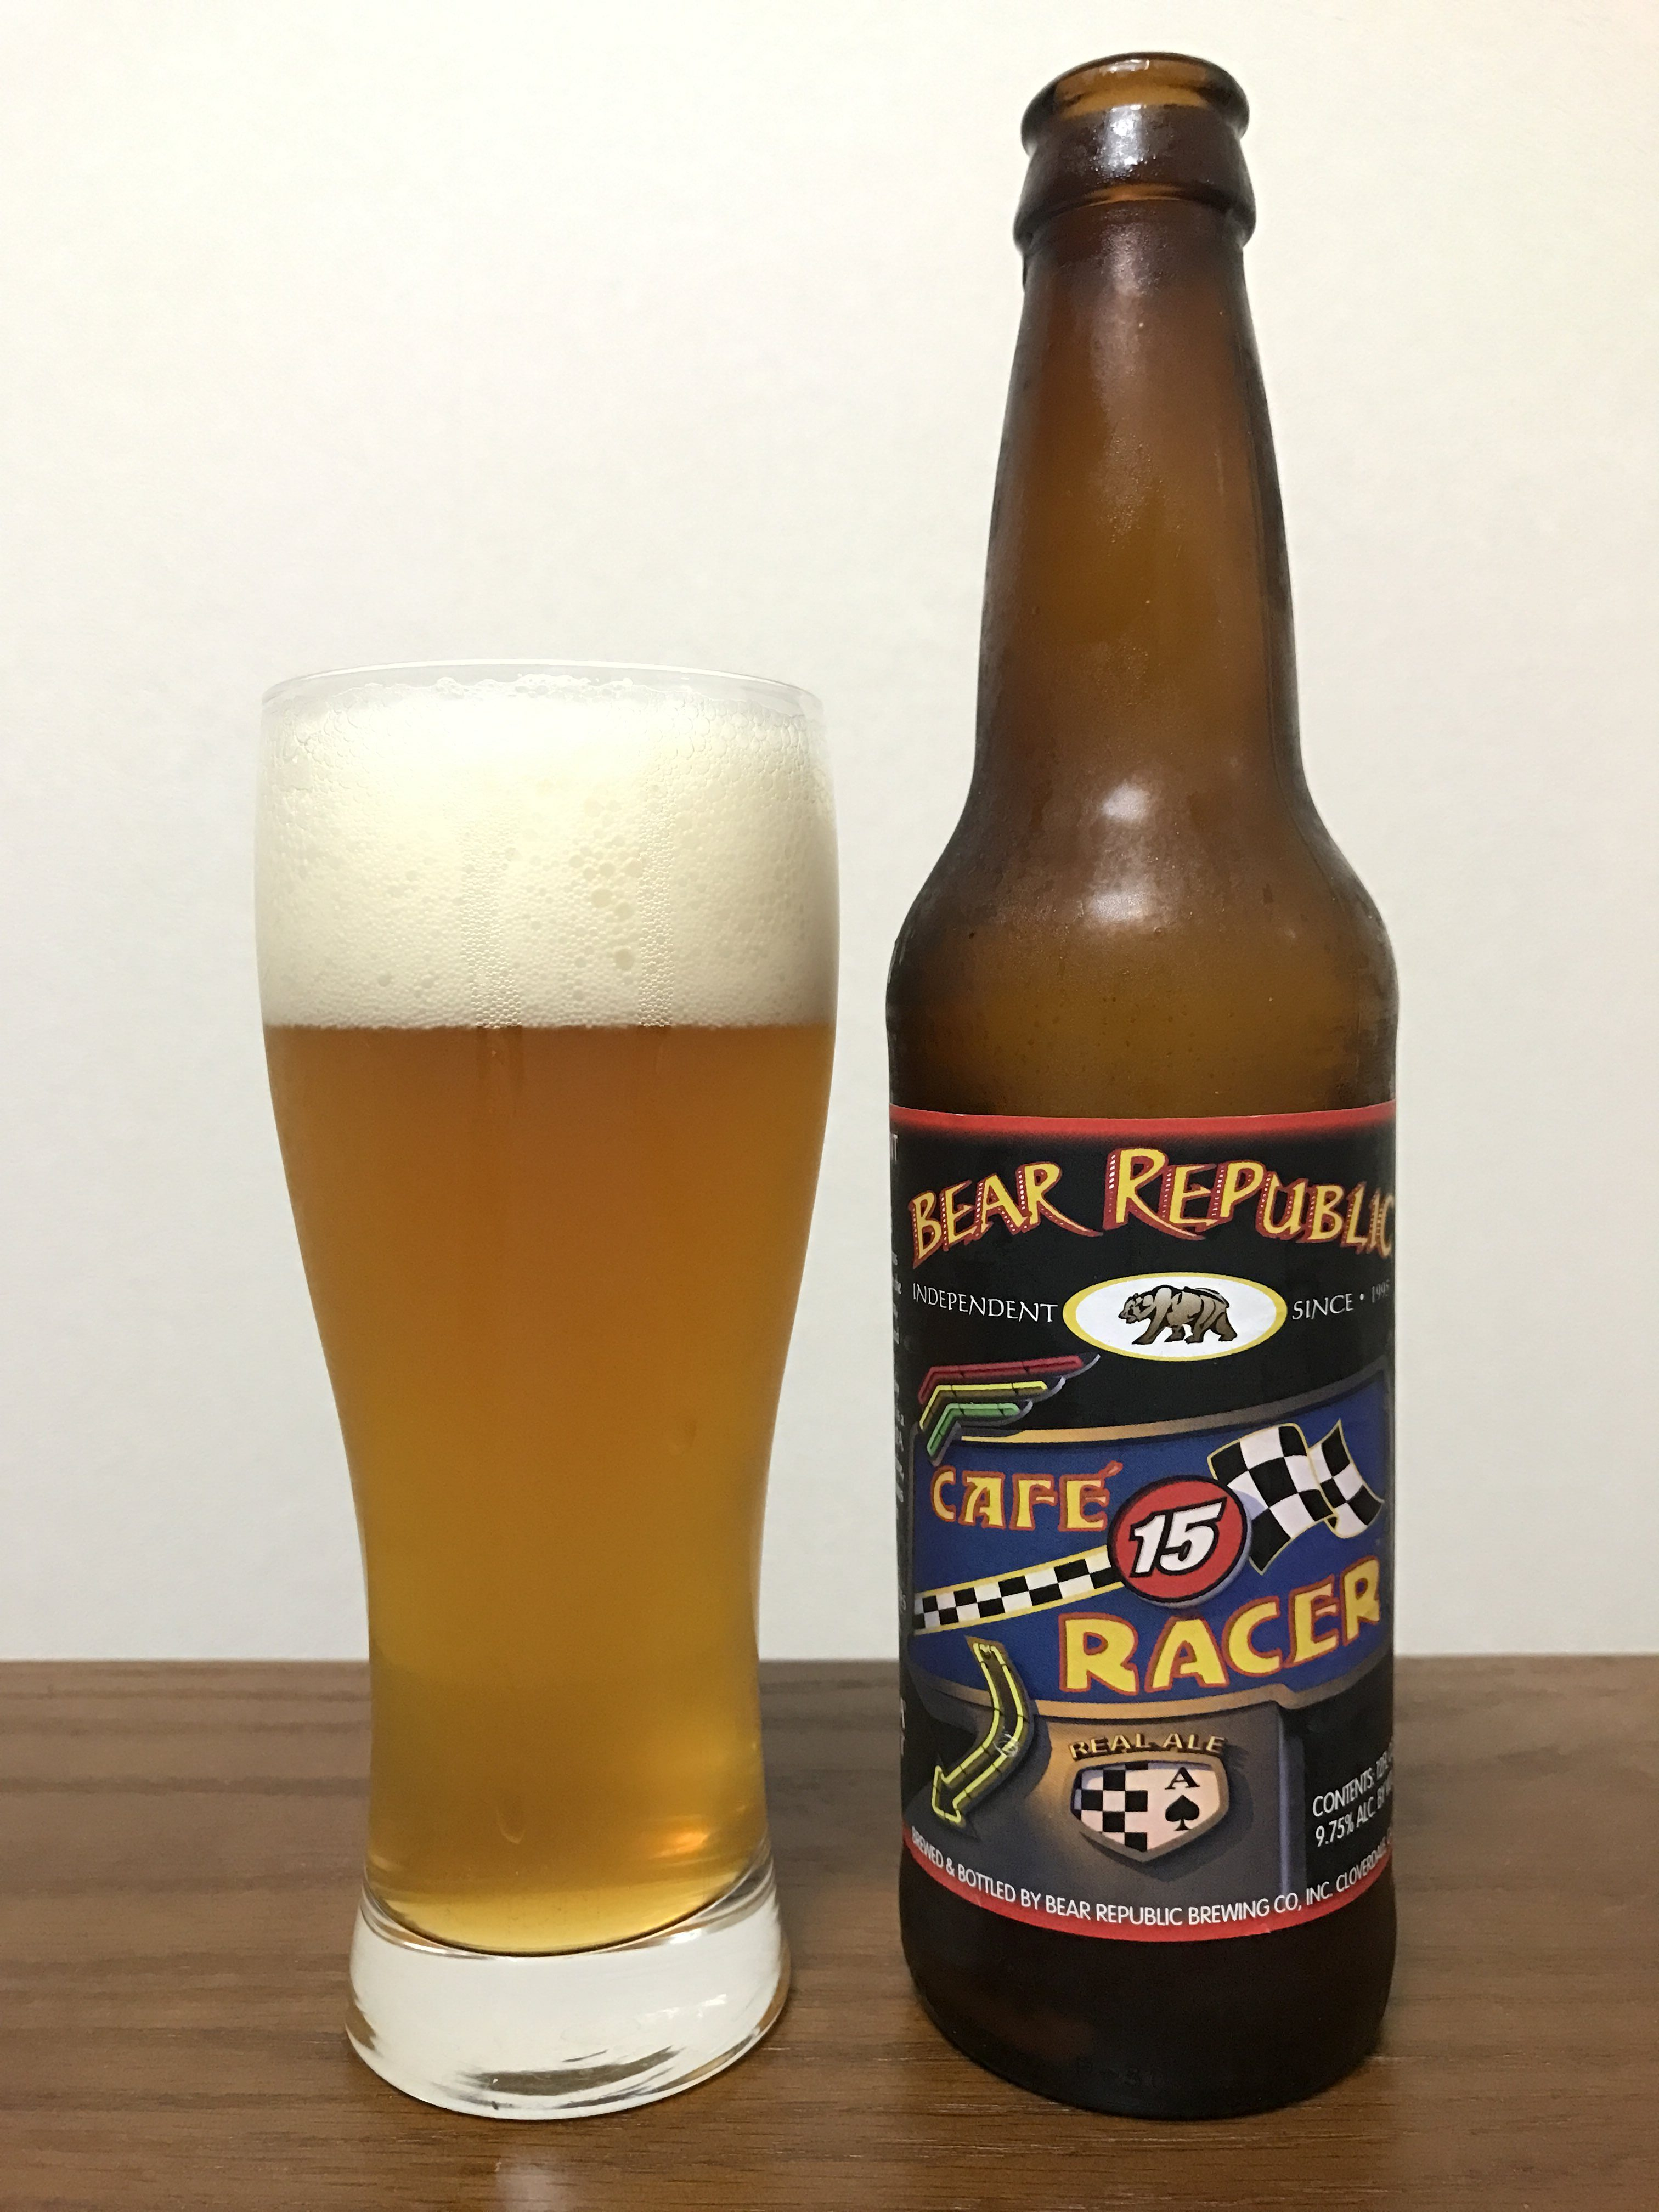 BEAR REPUBLIC CAFE RACER 15(ベア リパブリック カフェレーサー15)